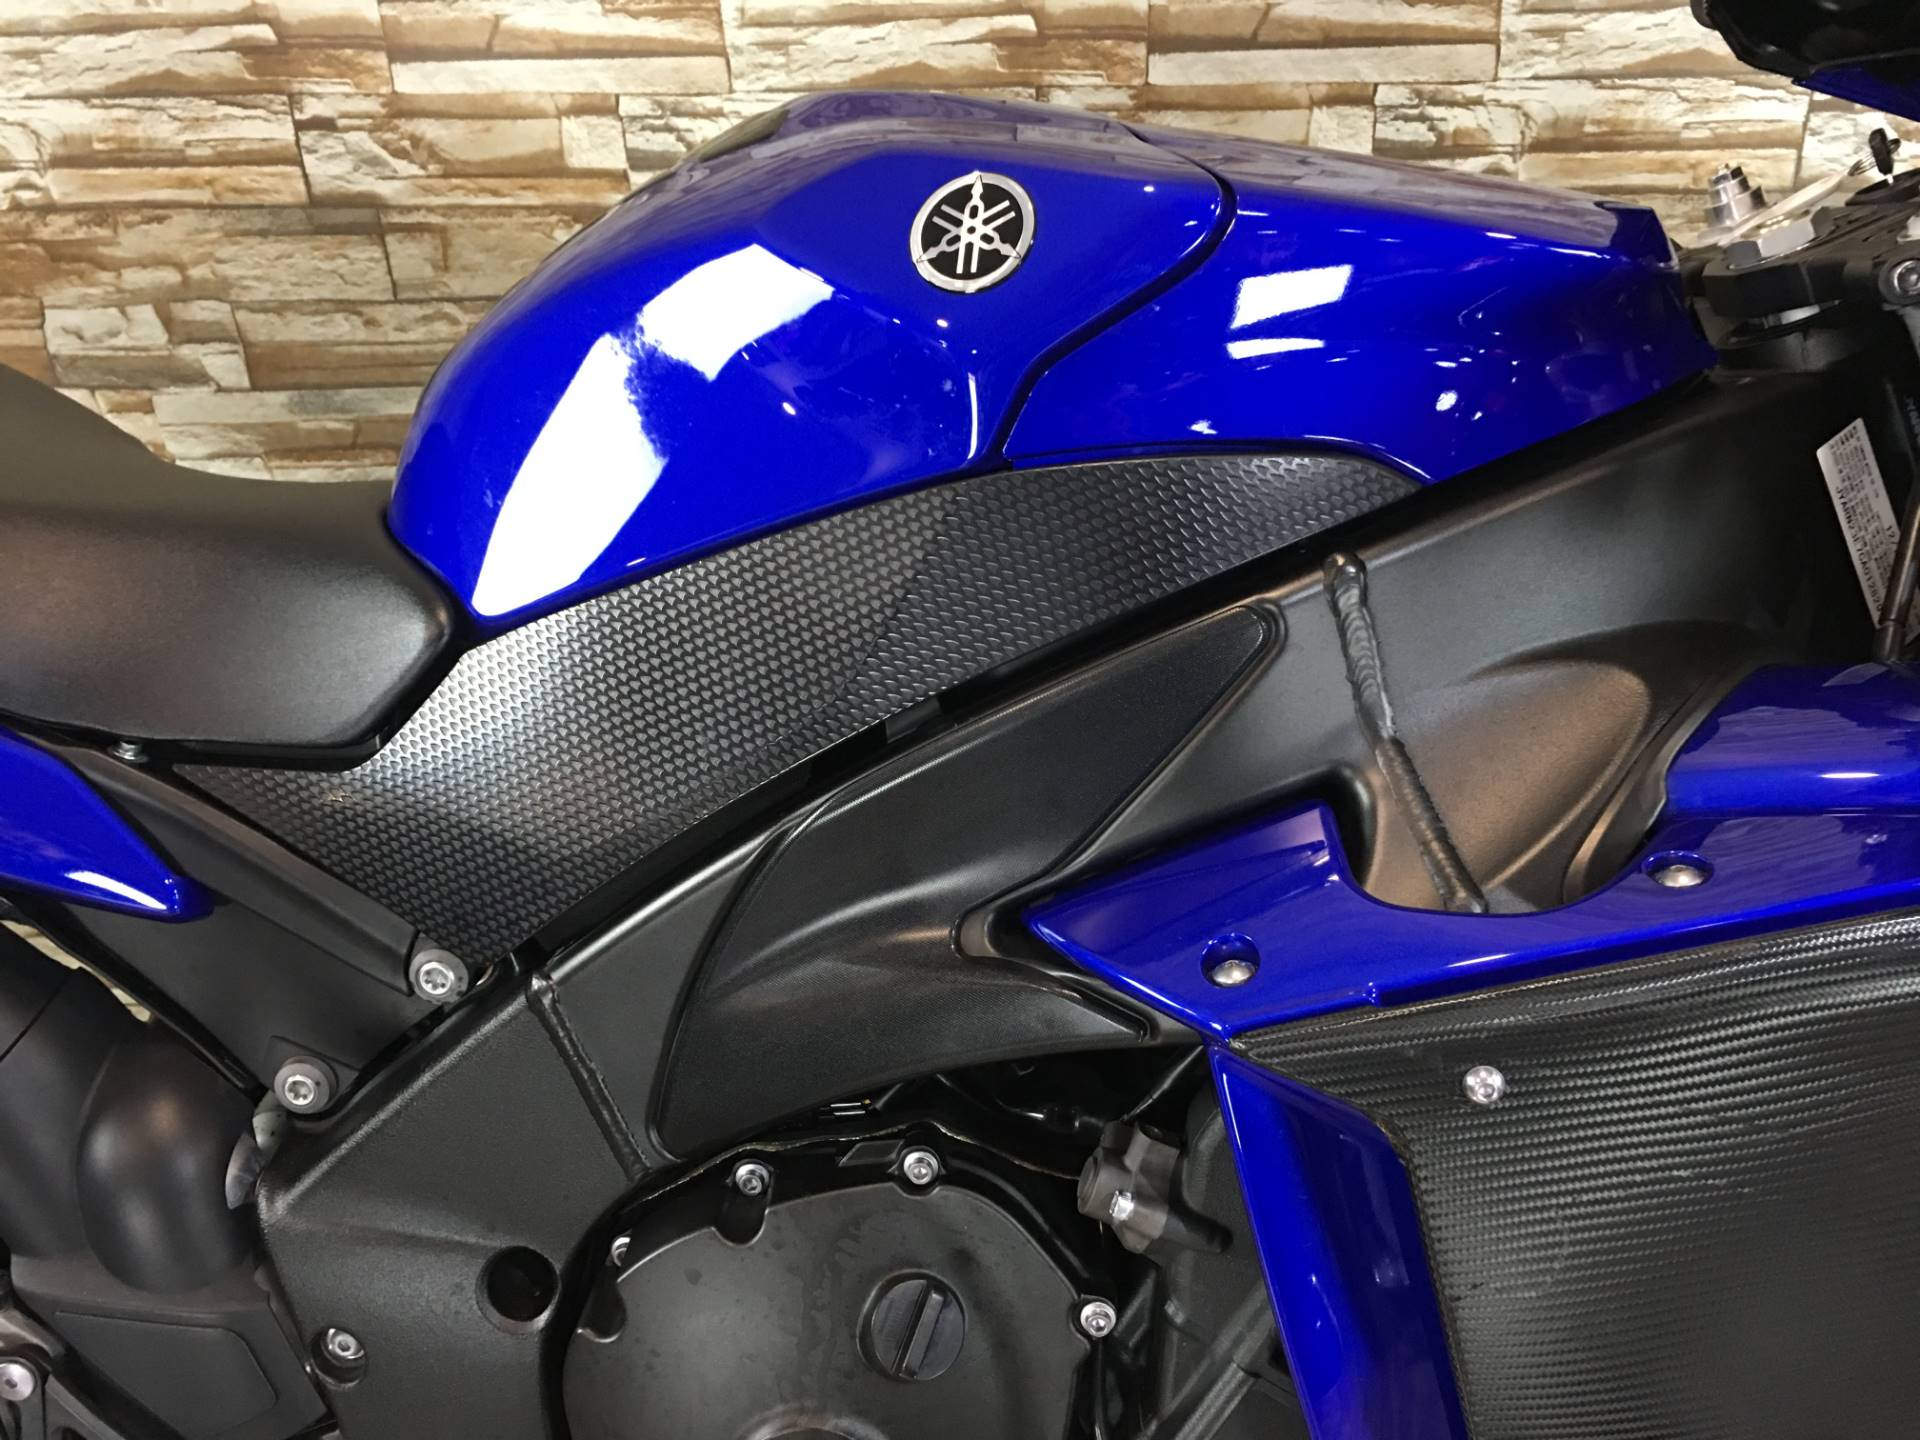 2012 Yamaha YZF-R1 11